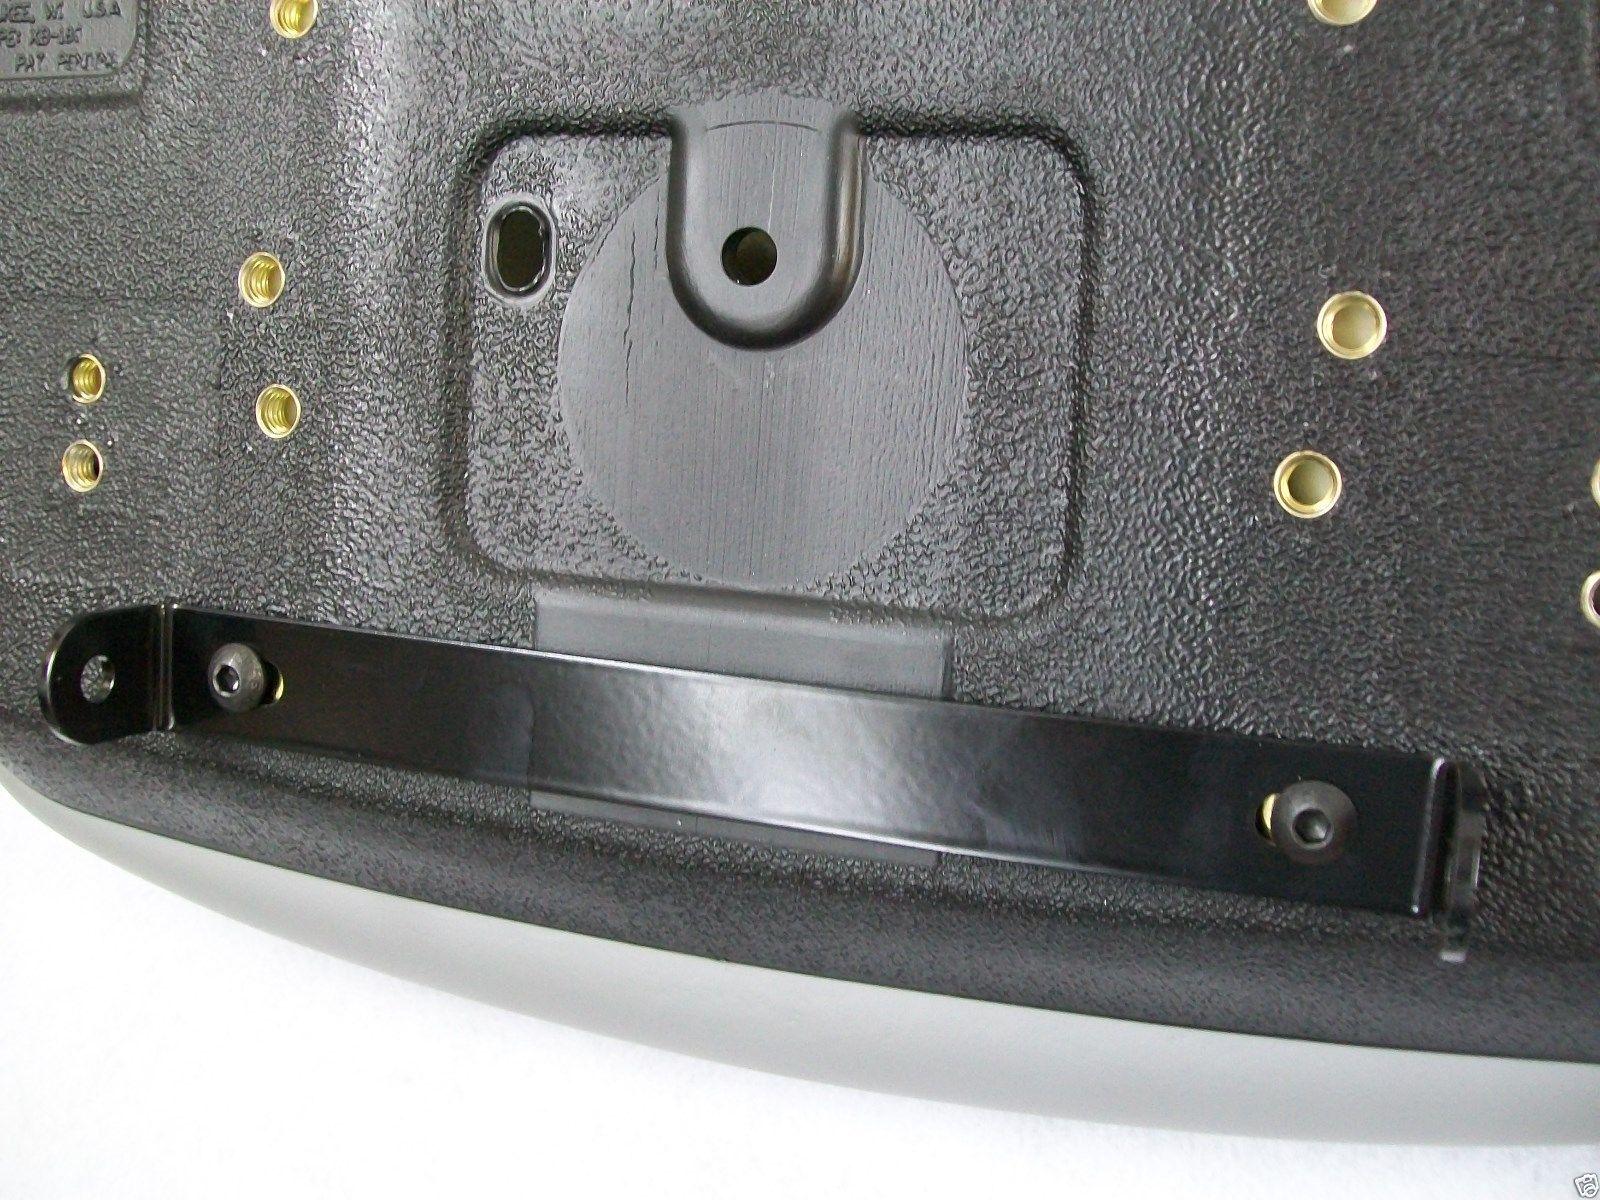 Kubota L48 Wiring Diagram 04 Chevy Monte Carlo Engine Diagram Bass – Kubota L4310 Wiring Diagram